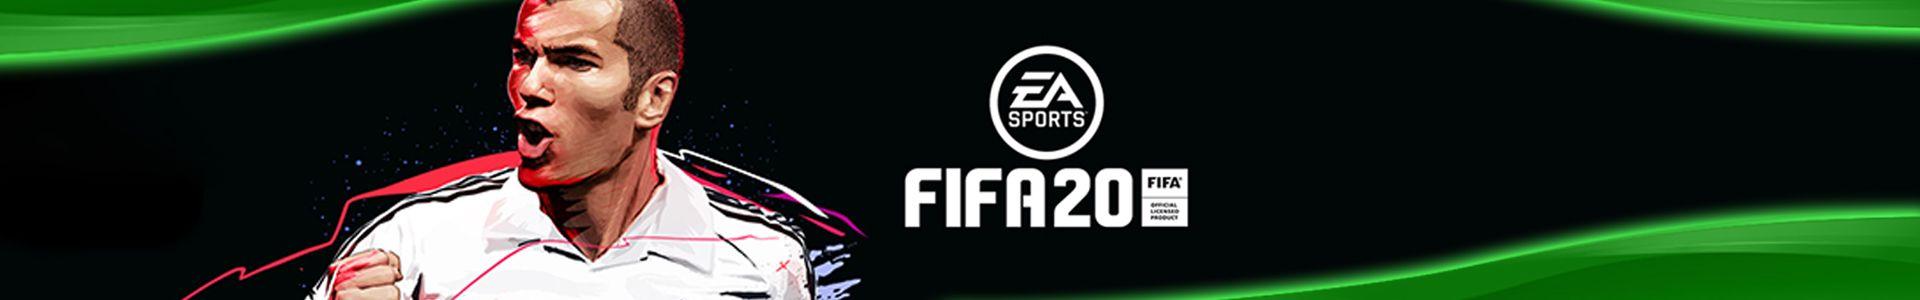 FIFA Points-lahjakortti